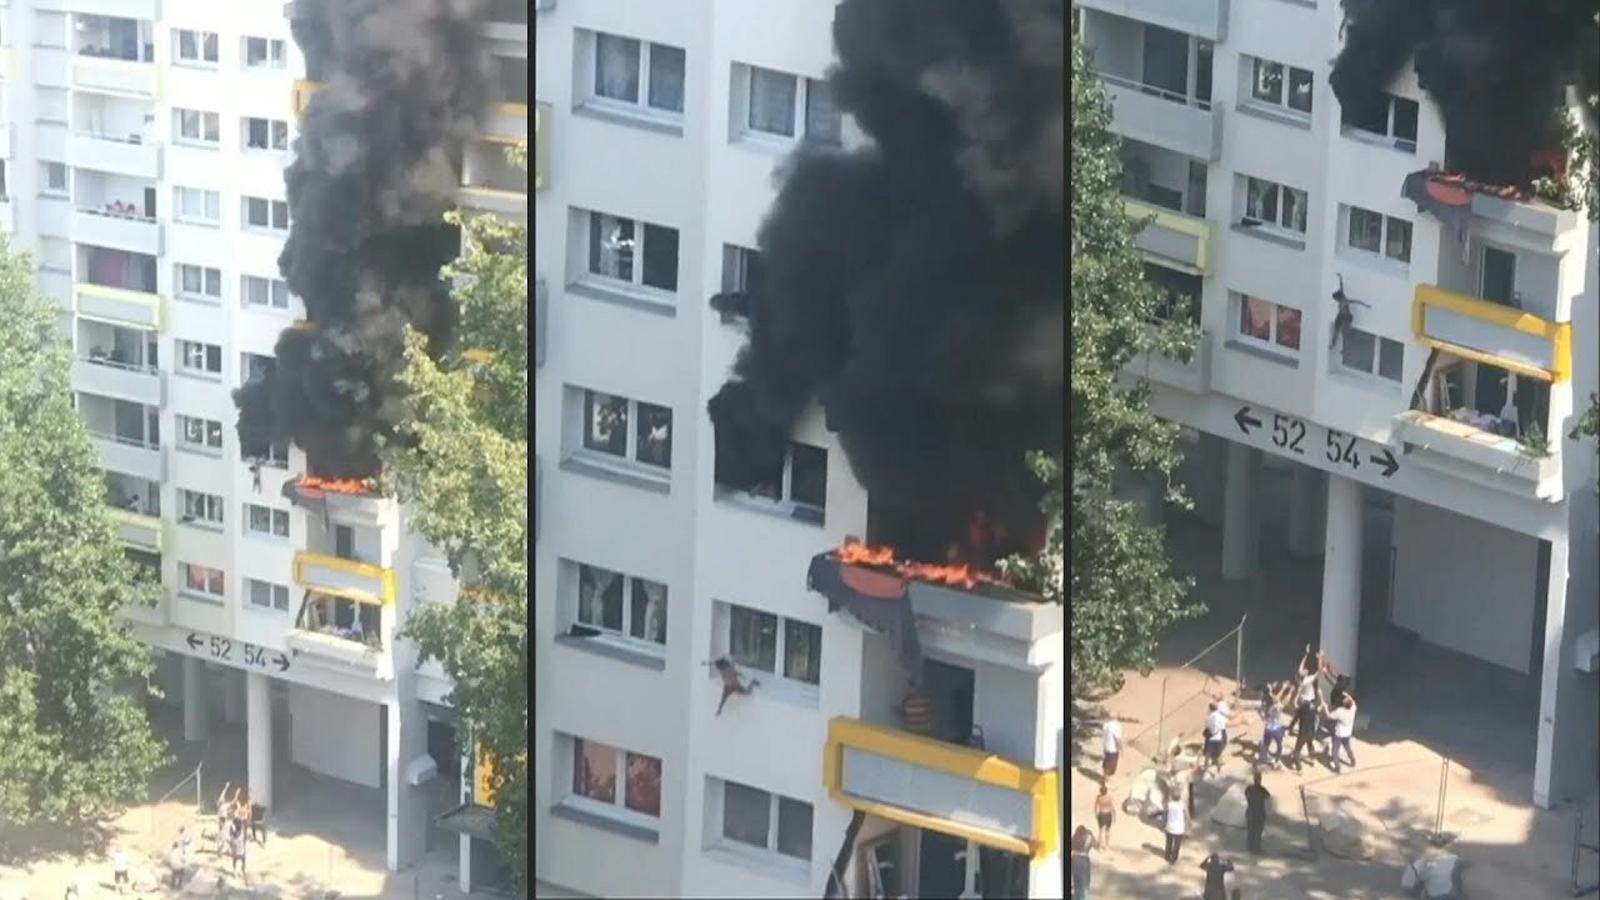 Un coixí de braços salva dos menors que salten d'un tercer pis en flames